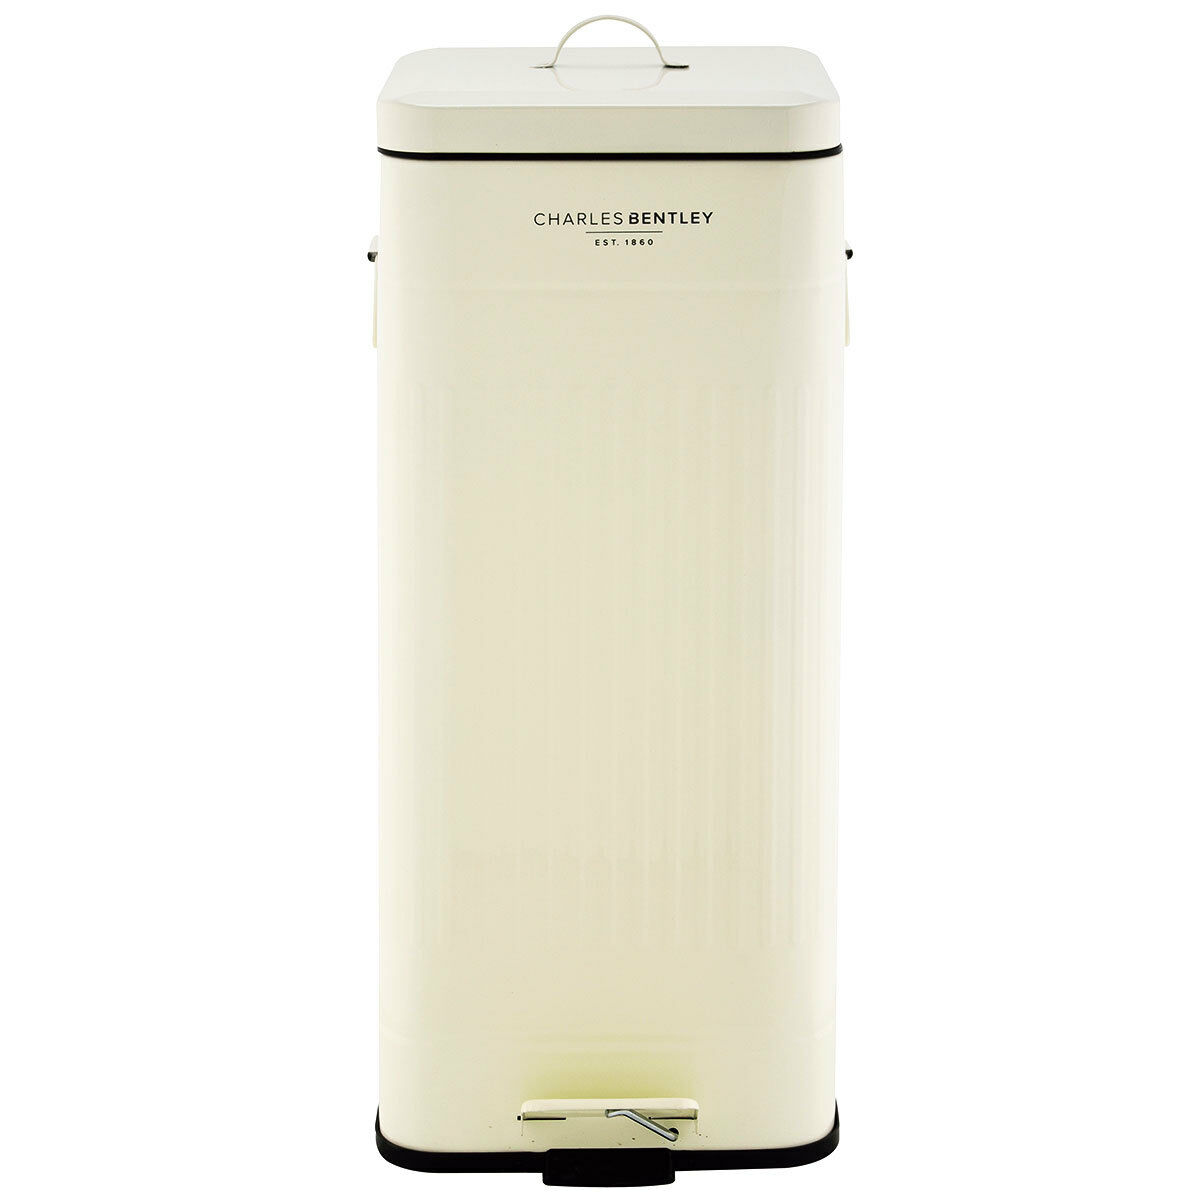 Charles Bentley 30L Steel Square Retro Kitchen Pedal Waste Bin - Cream